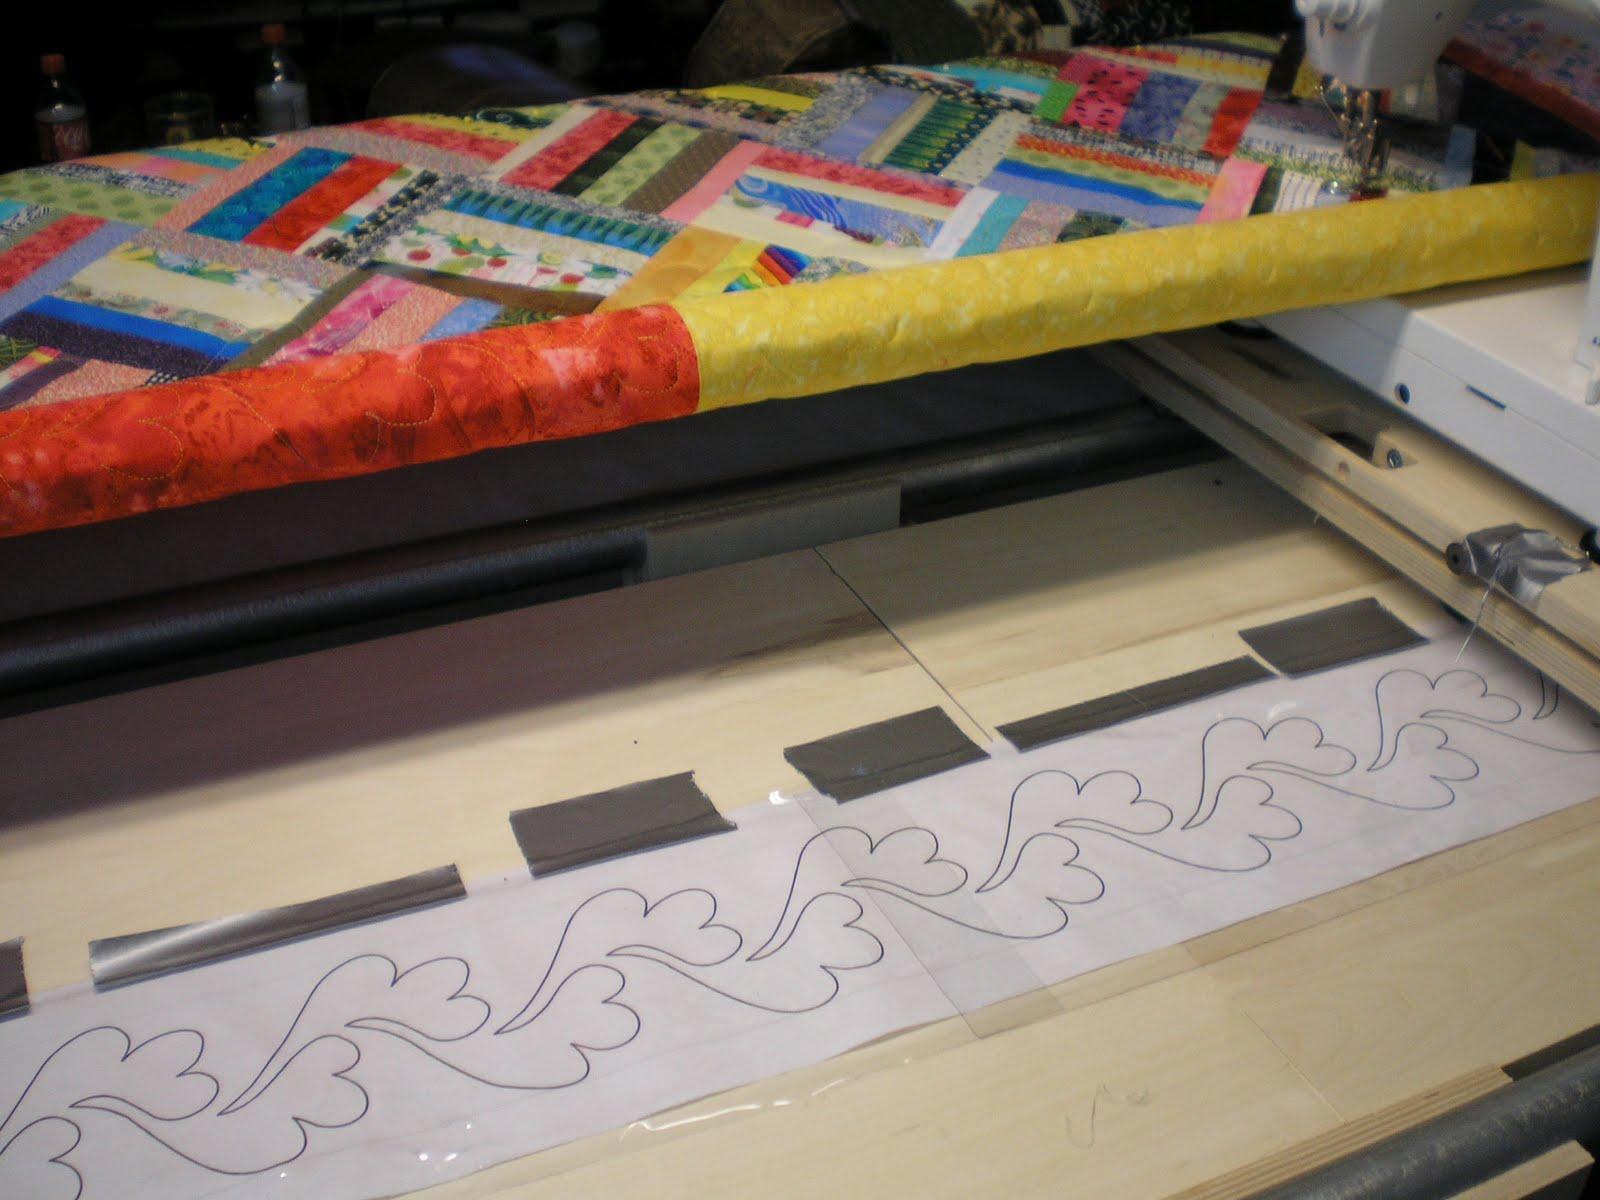 Wilma's World: Quilting the Basket Weave Quilt : proflex quilting frame - Adamdwight.com